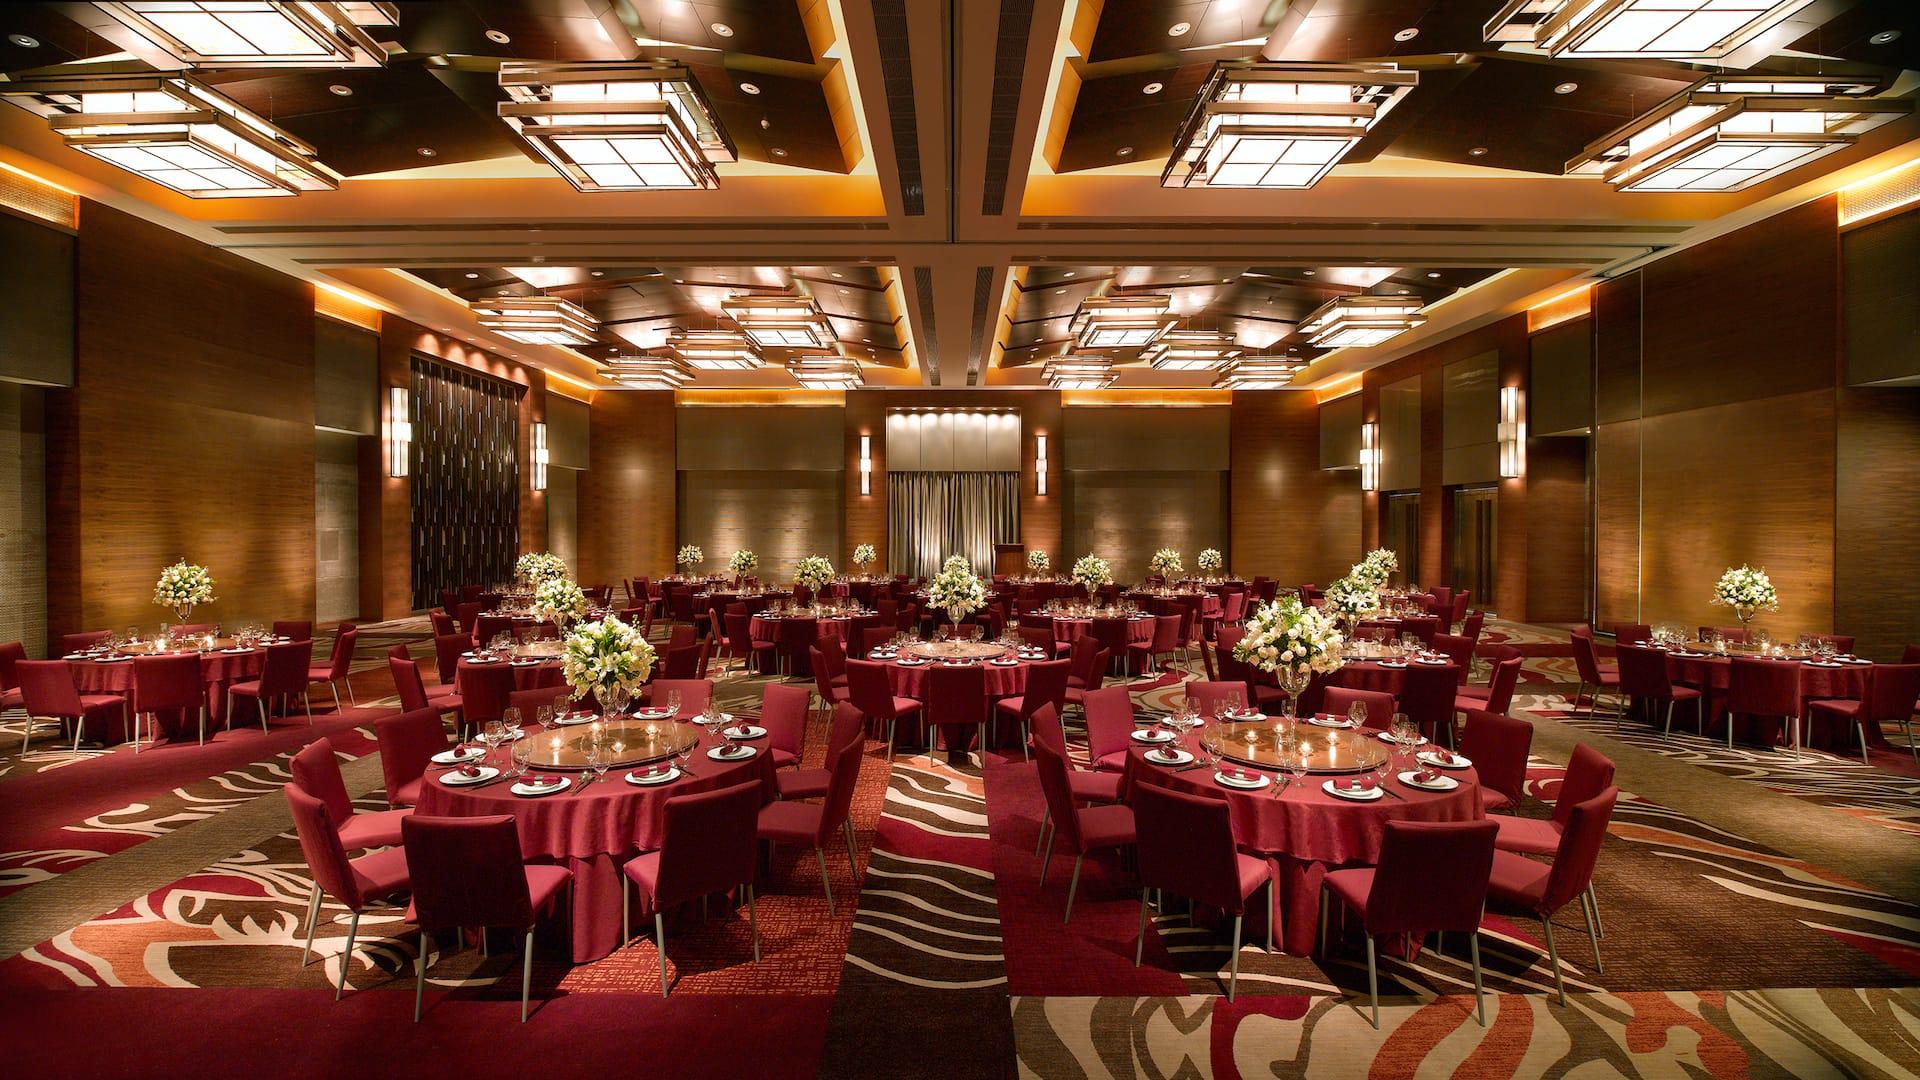 Ballroom with banquet setup